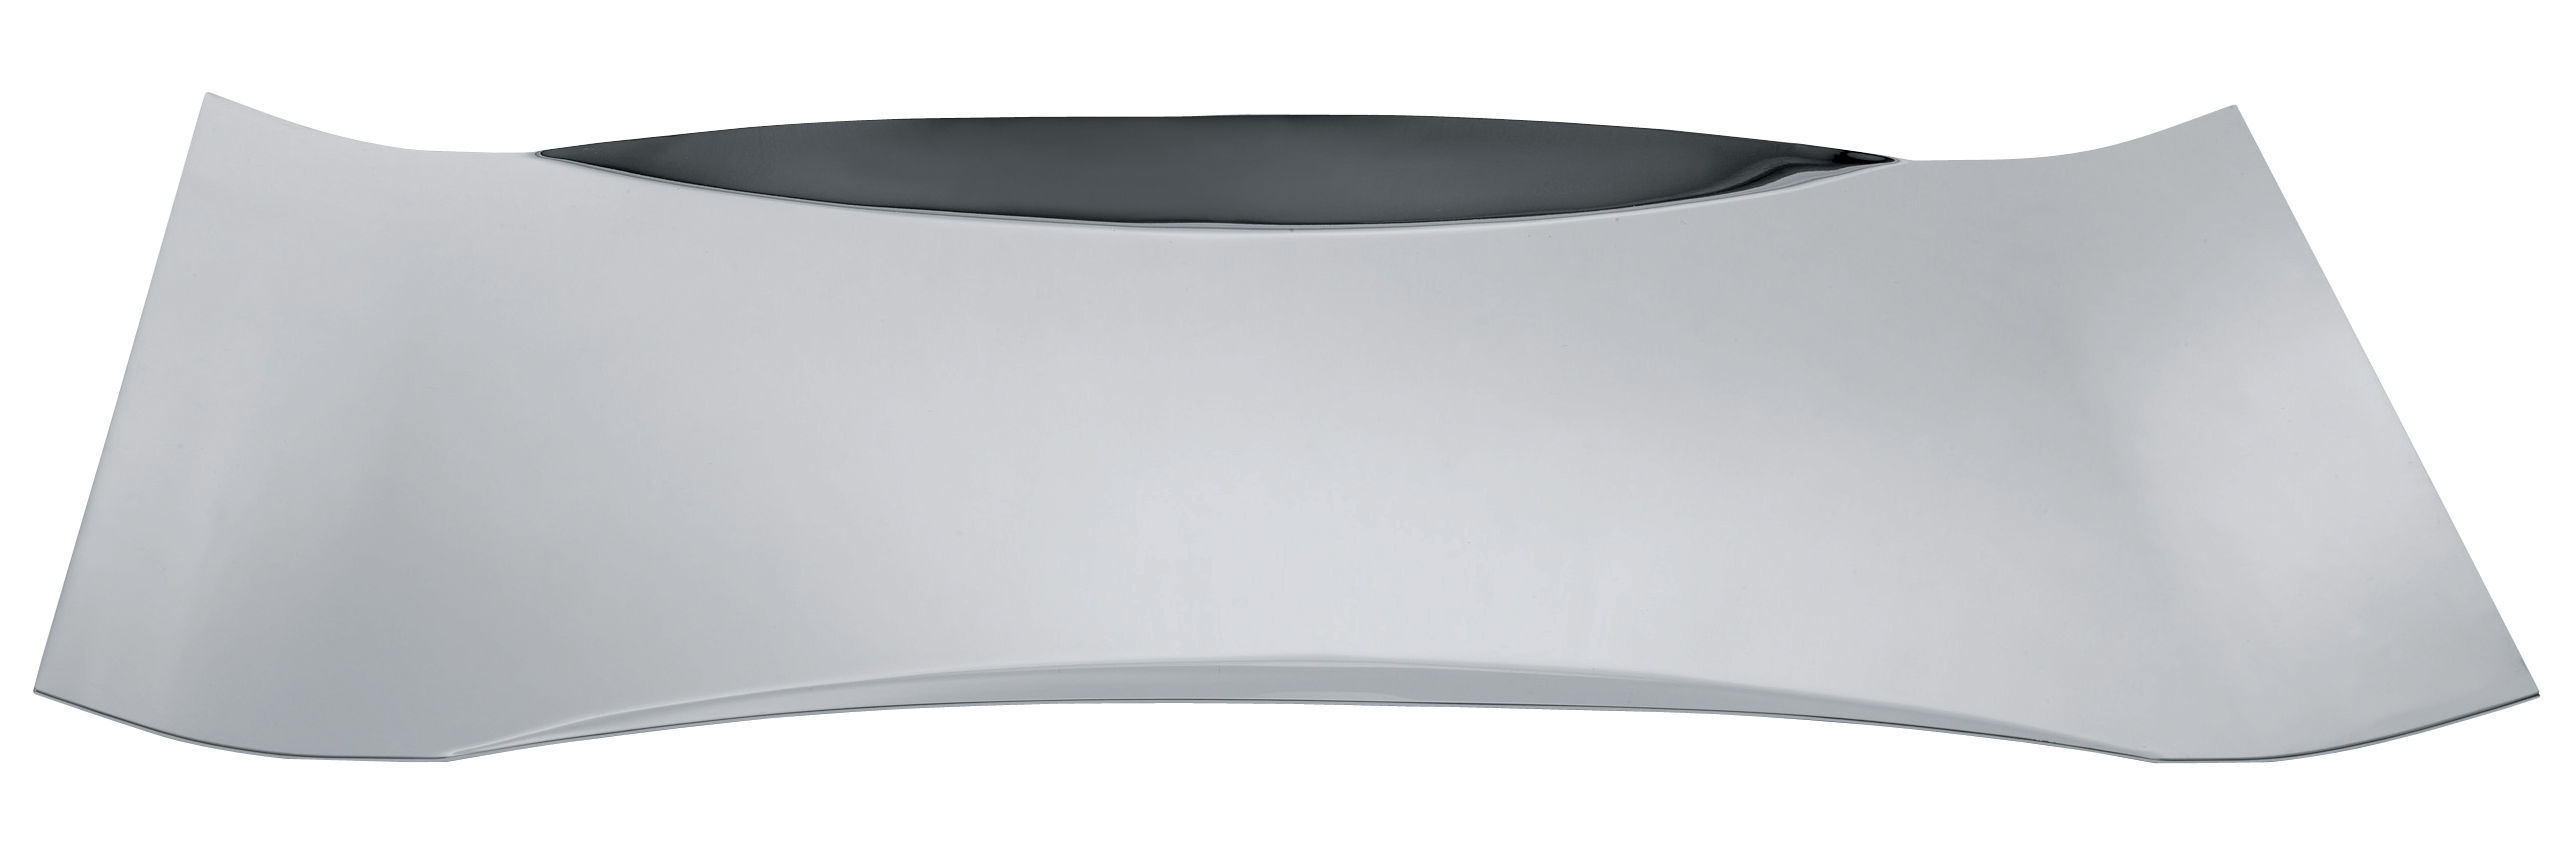 Arts de la table - Plateaux - Plateau Mao-Mao / 55 x 38 cm - Alessi - Acier - Acier inoxydable